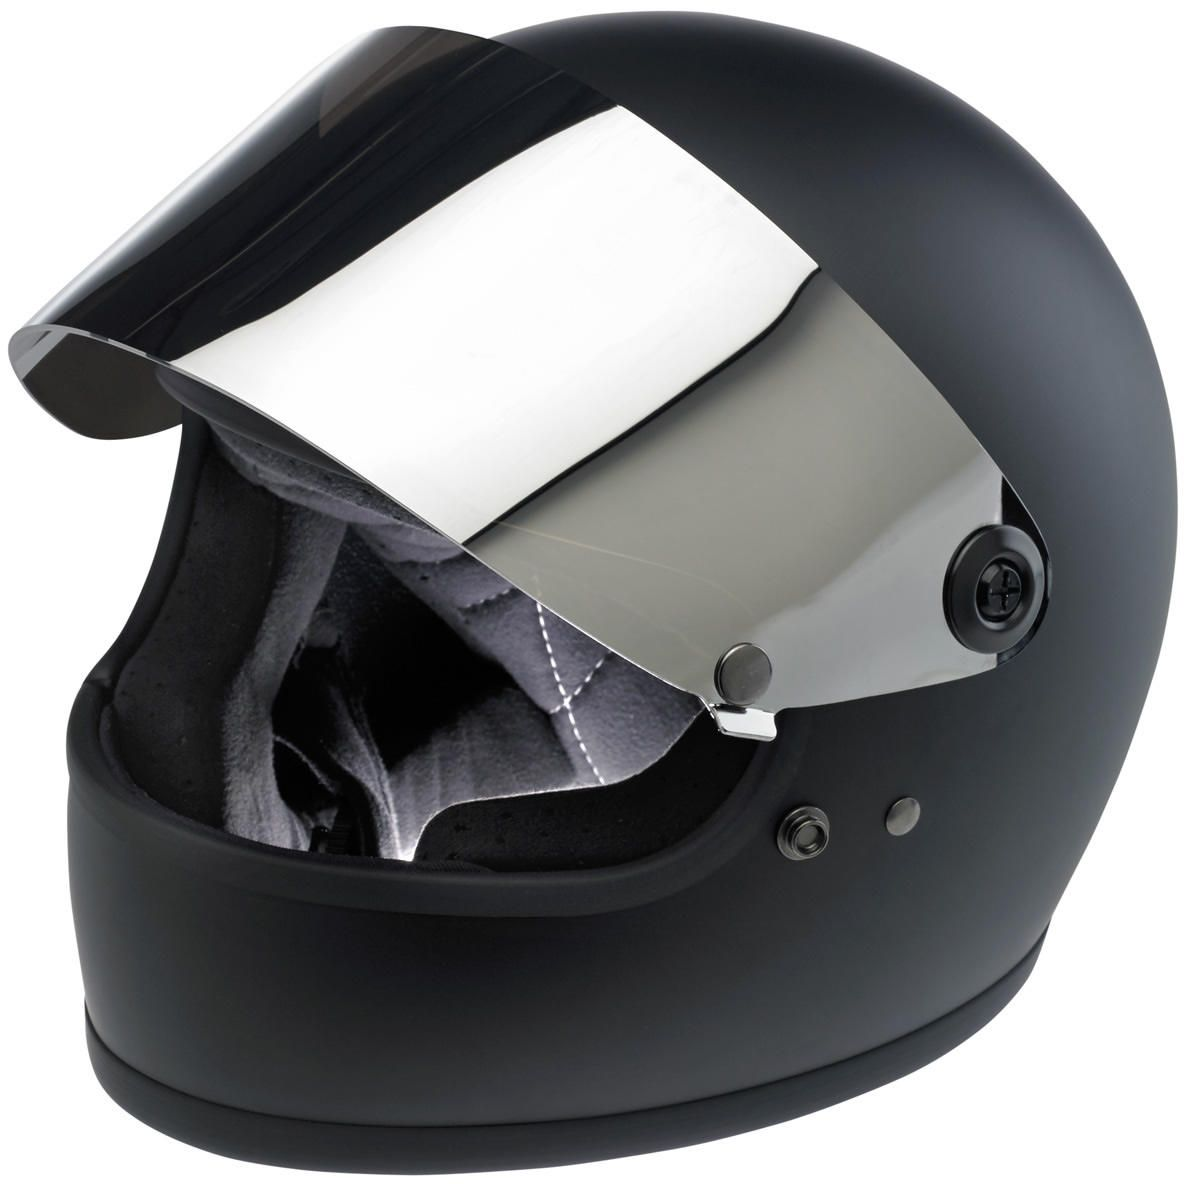 Biltwell Gringo Helmet Blast Shield Smoke, Large